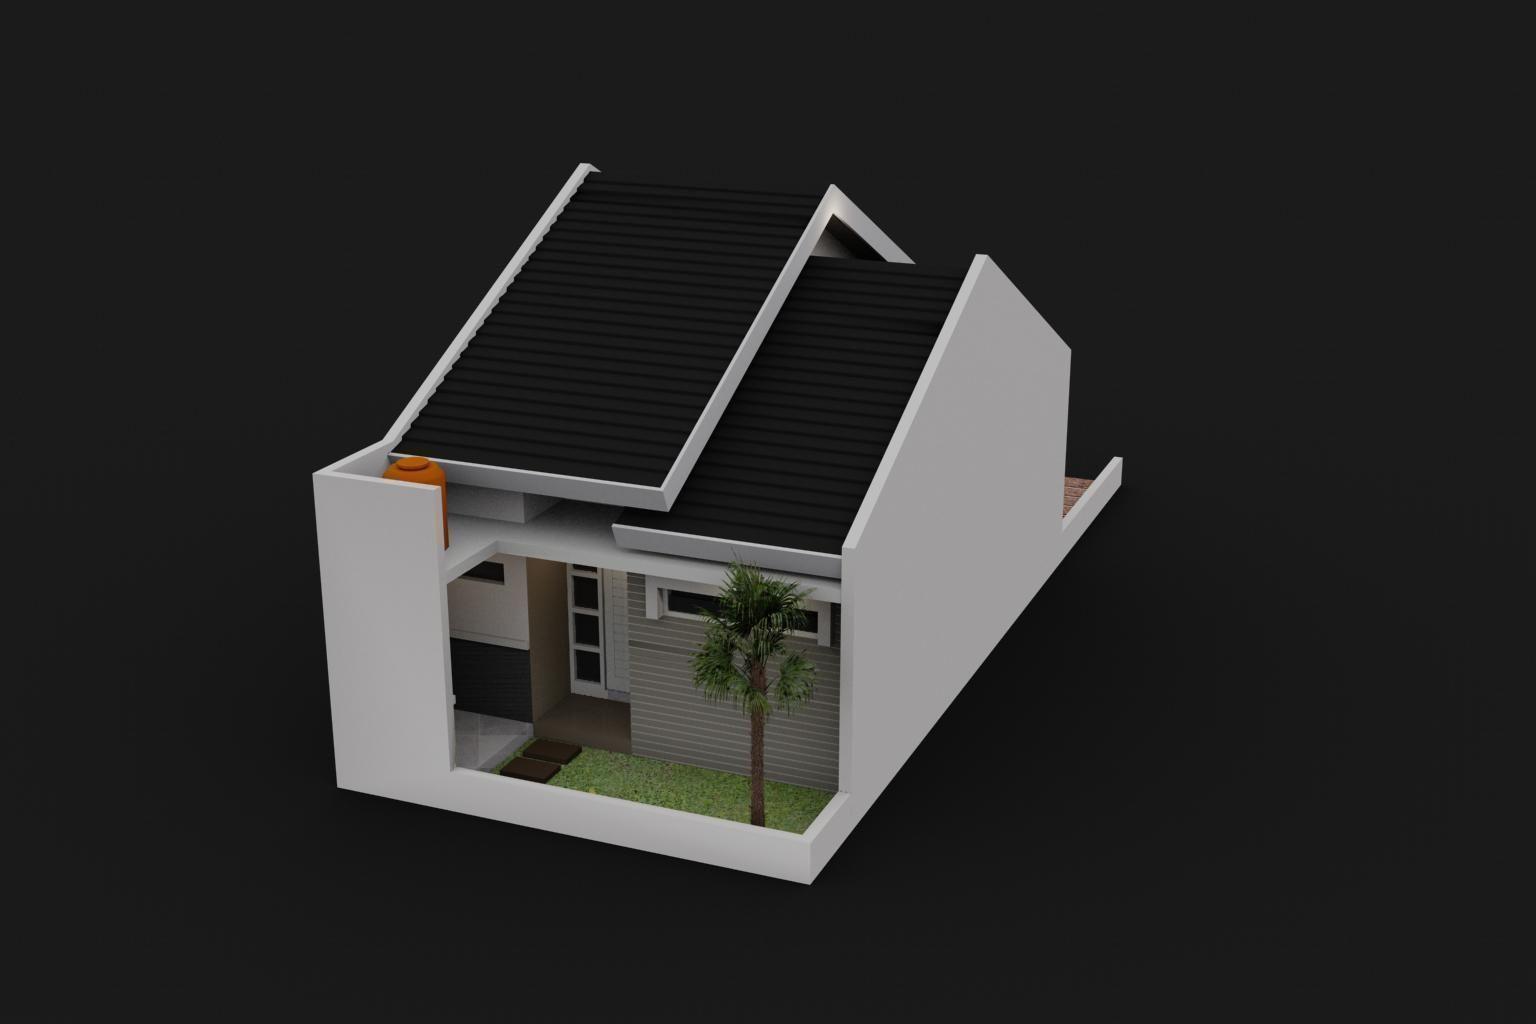 Small House Design 3d Model Max